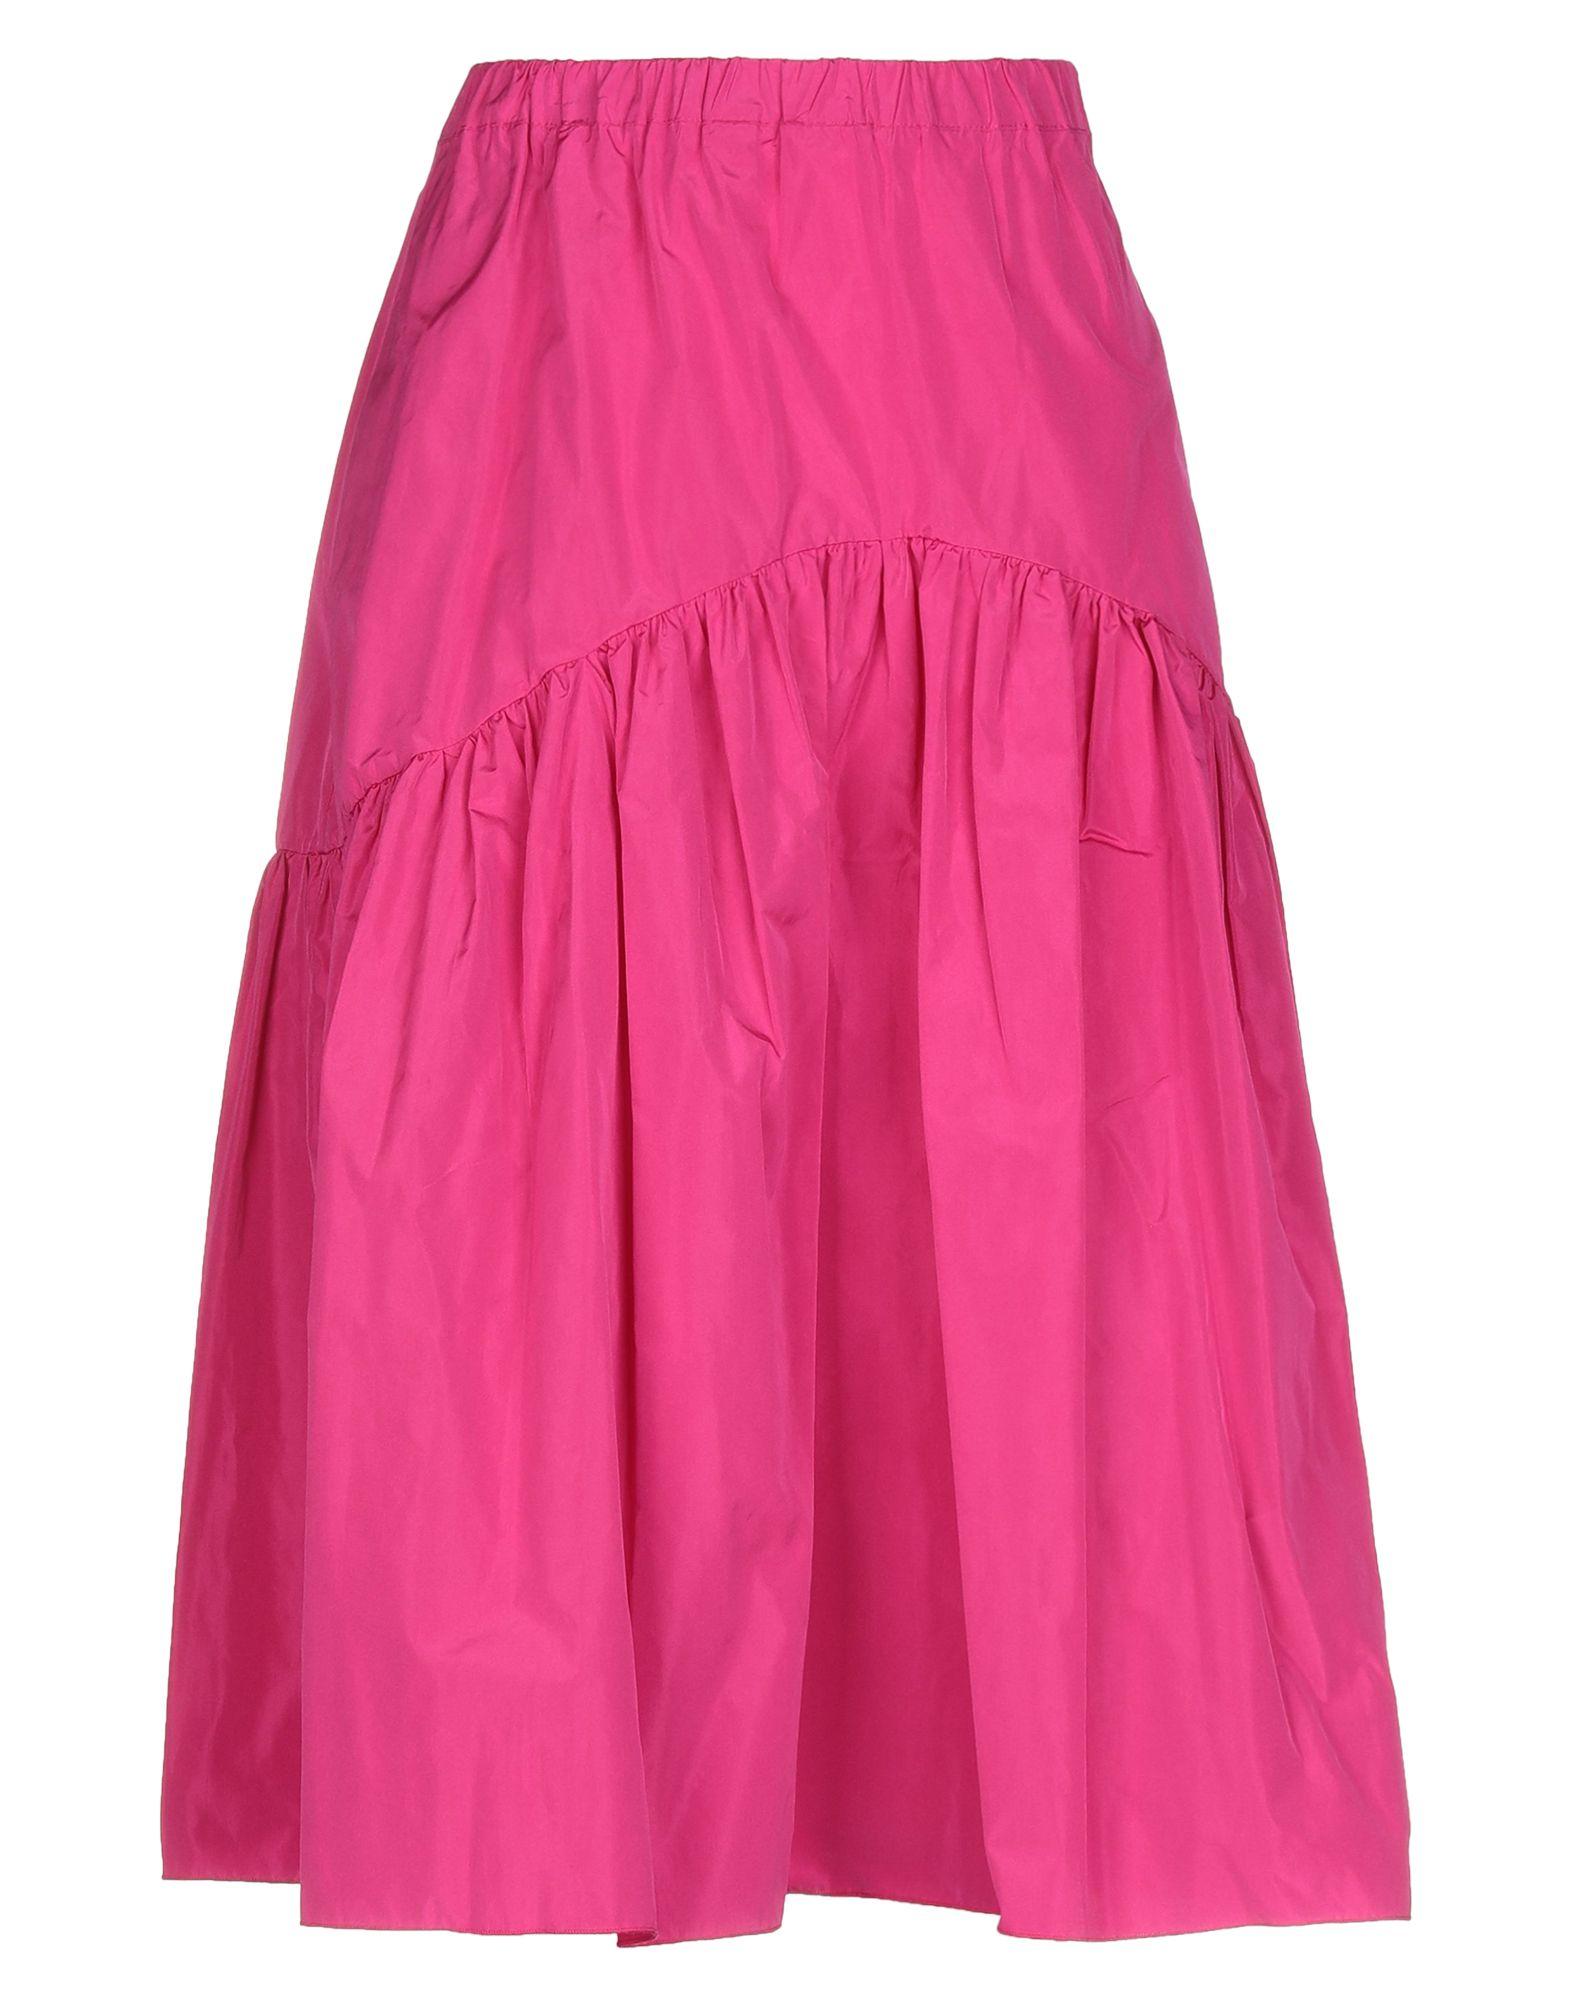 BLUGIRL BLUMARINE Юбка длиной 3/4 pianurastudio юбка длиной 3 4